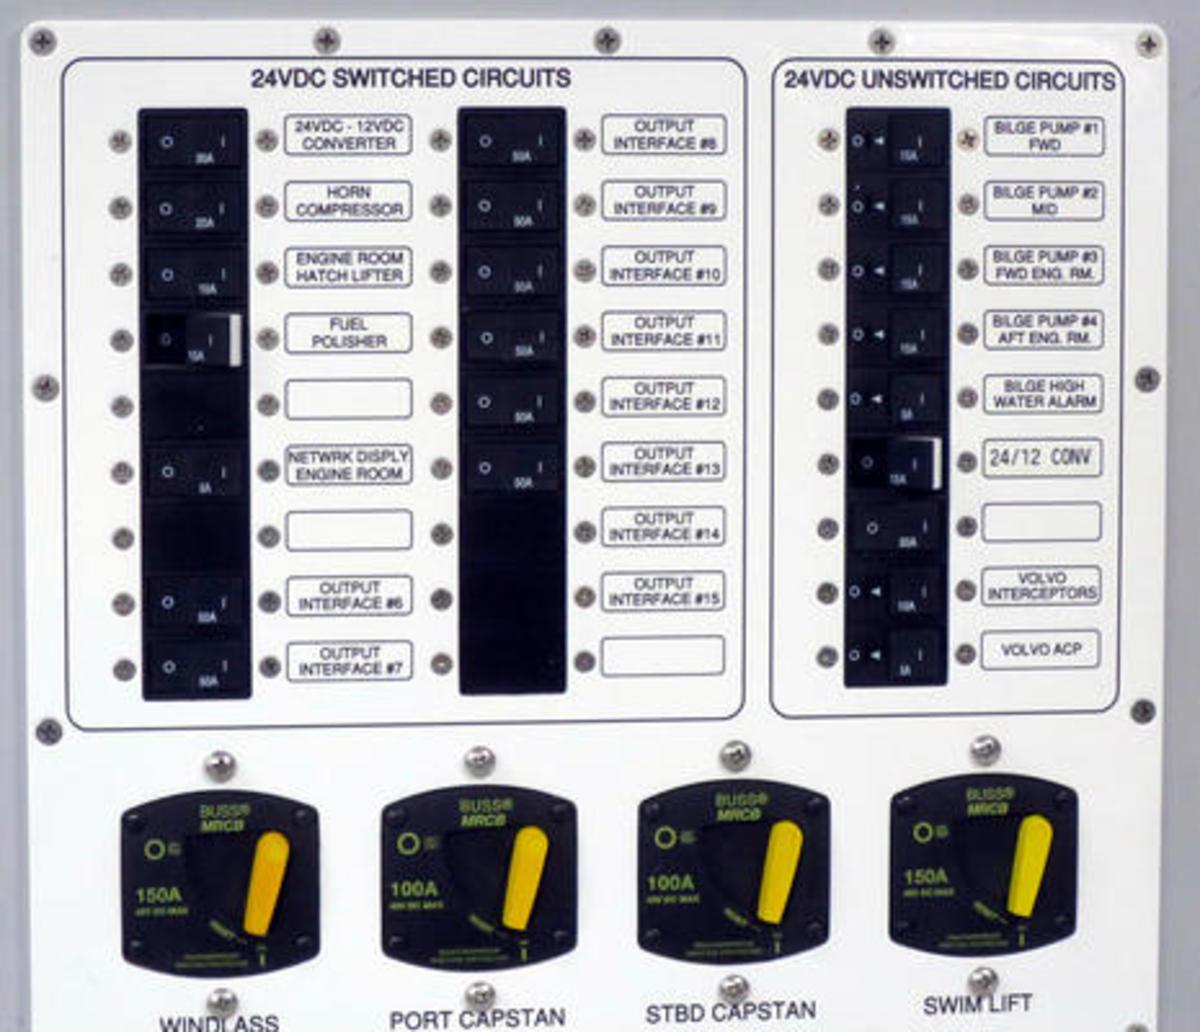 Sabre_66_hull_1_engine_room_24v_panel_cPanbo.JPG